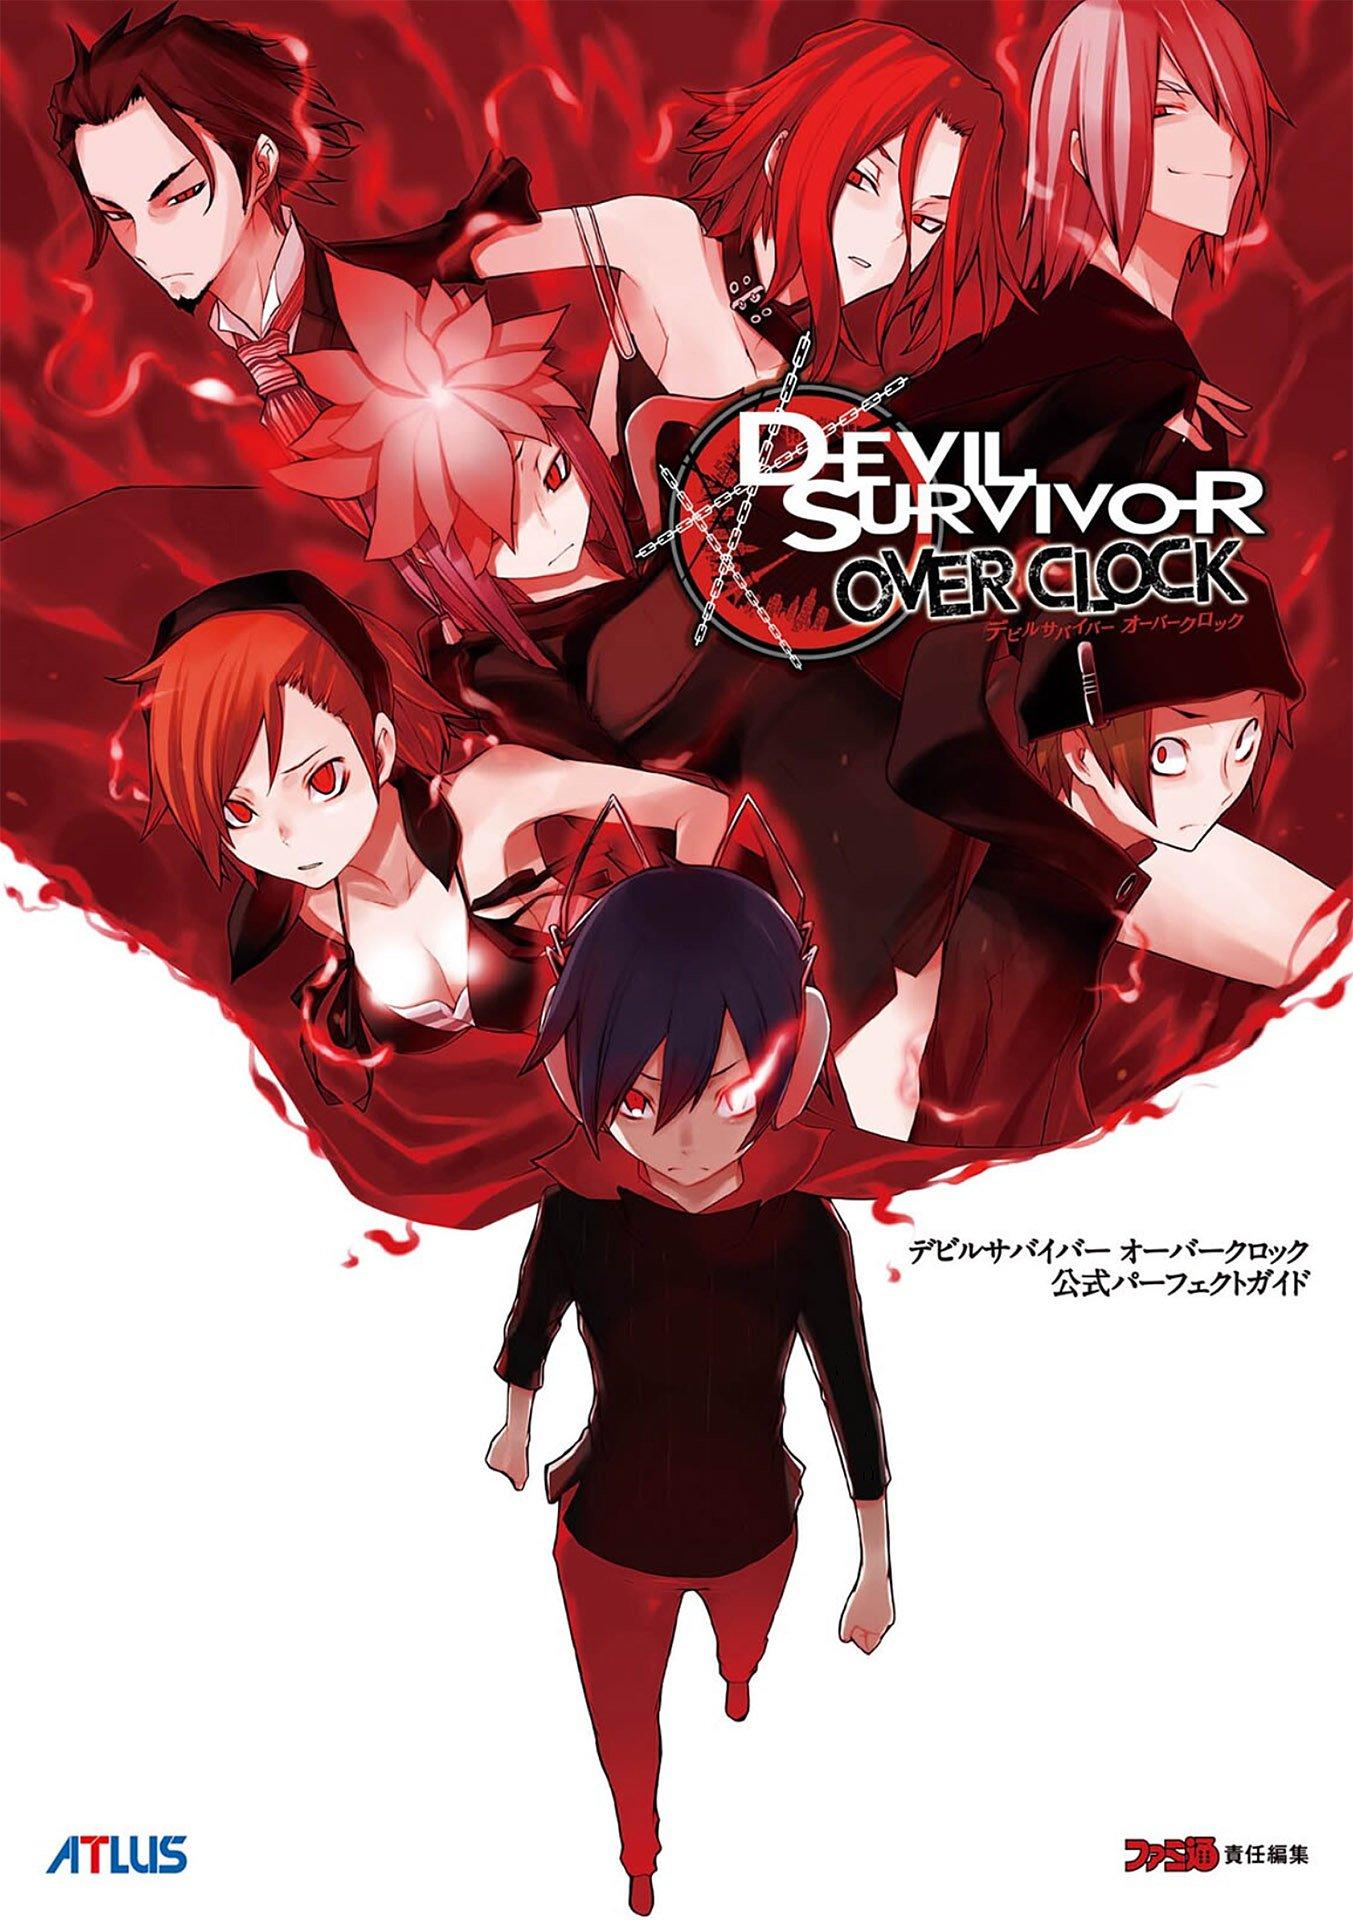 Devil Survivor Overclock - Official Perfect Guide